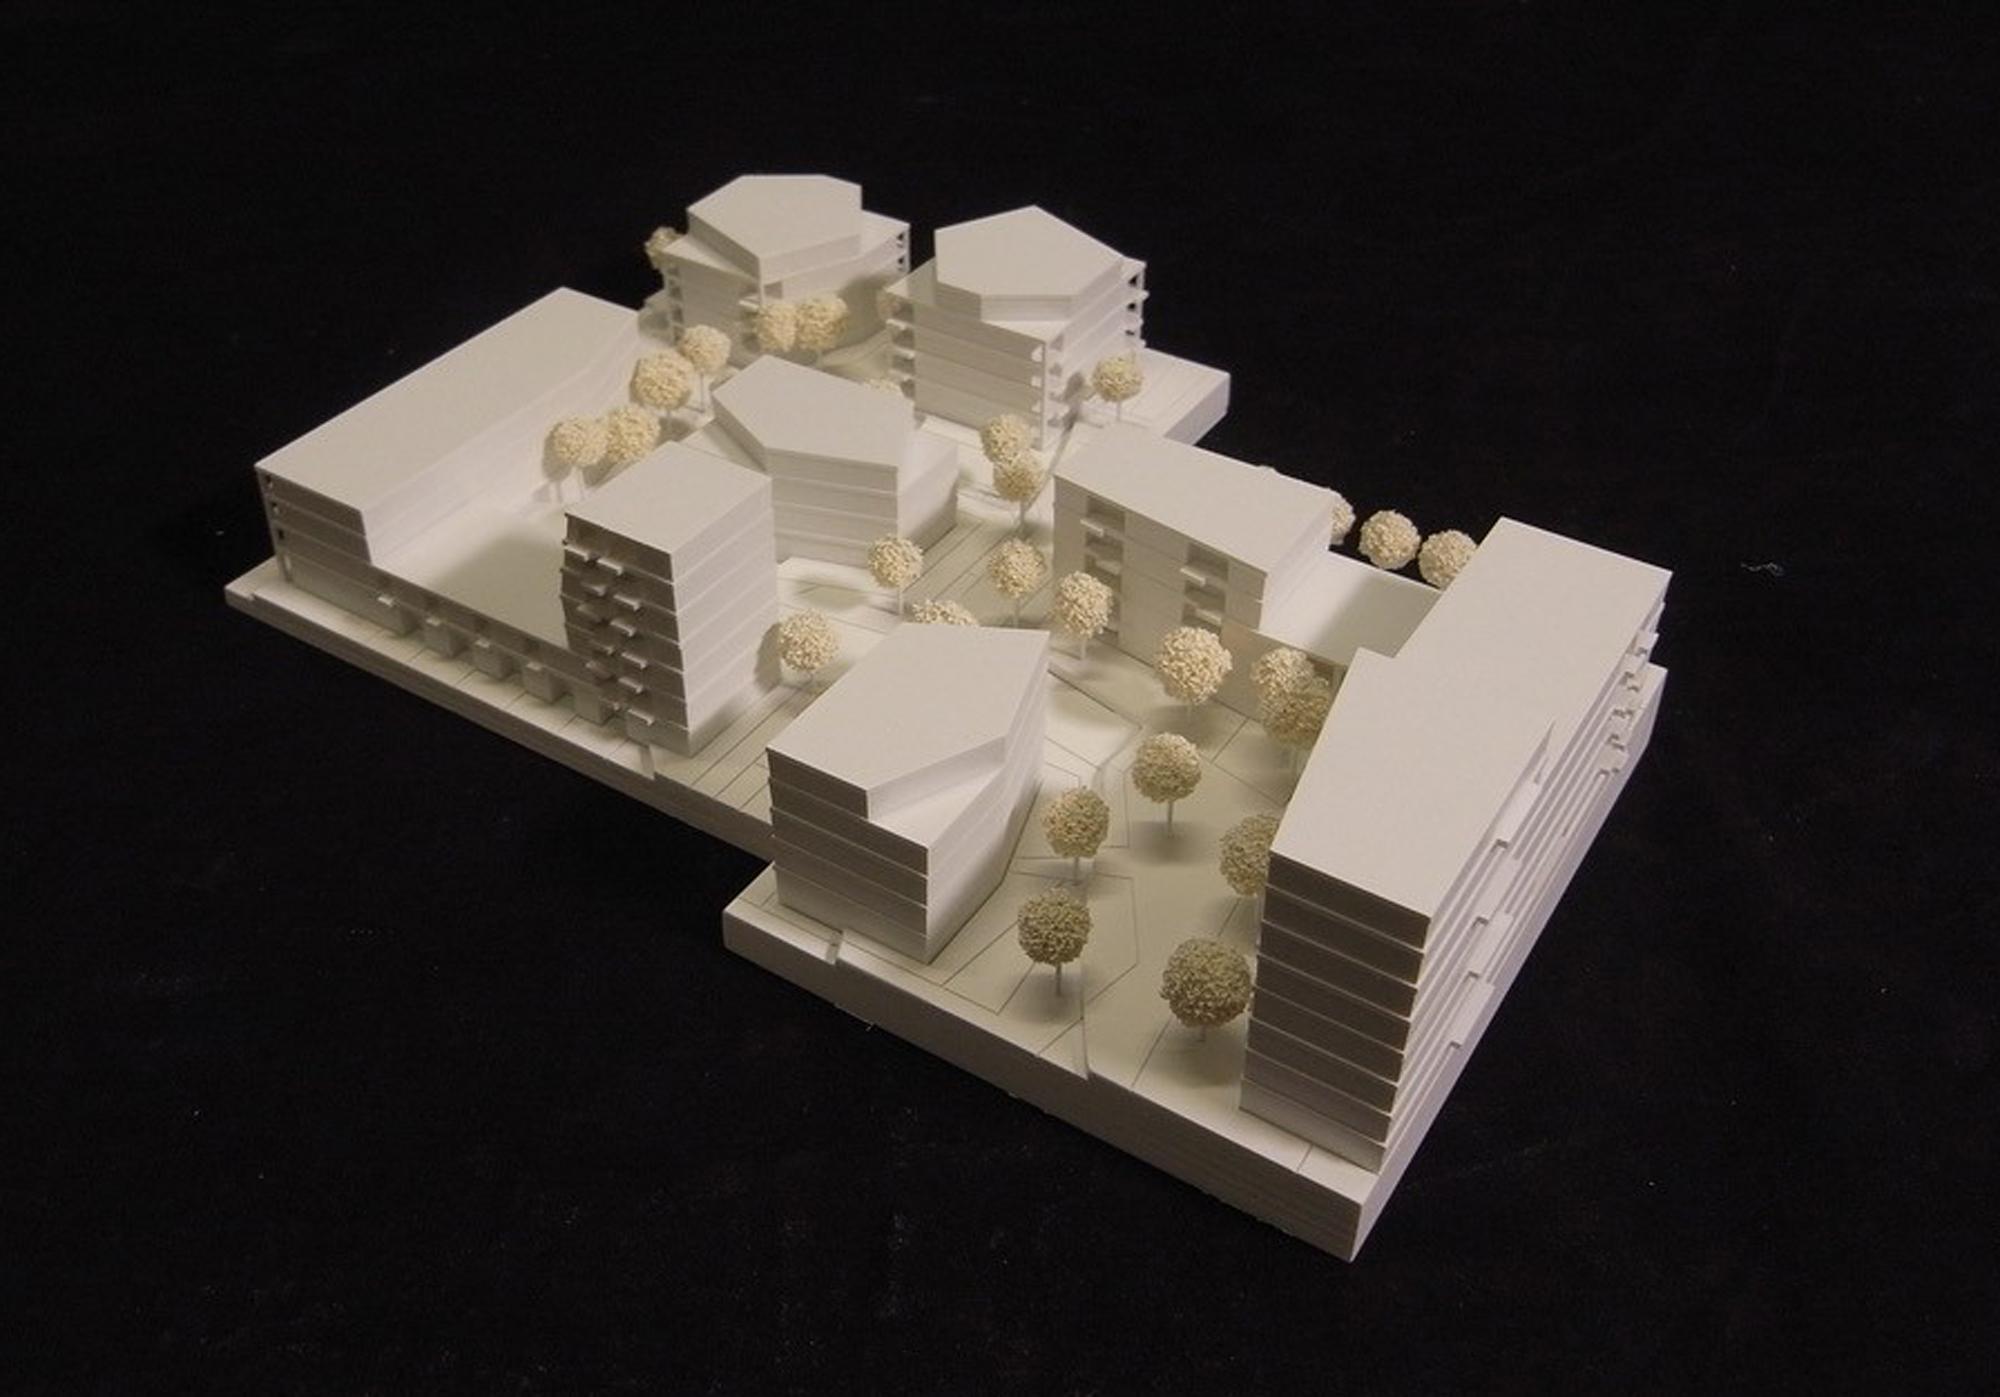 Projekt 355 Modell FFM-ARCHITEKTEN